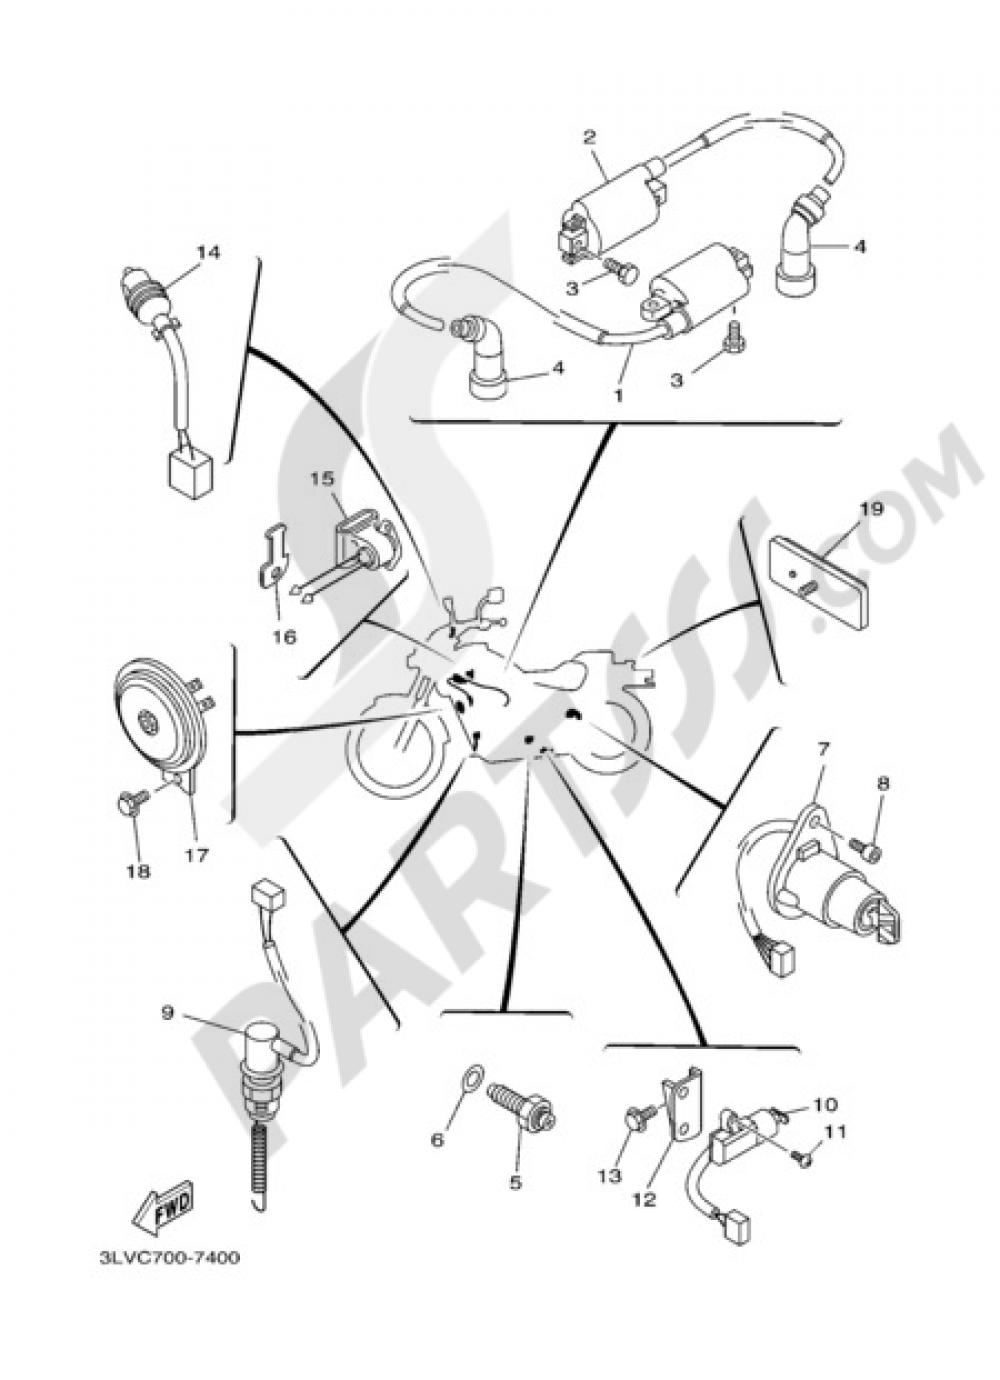 hight resolution of 2004 yamaha virago 250 wiring diagram